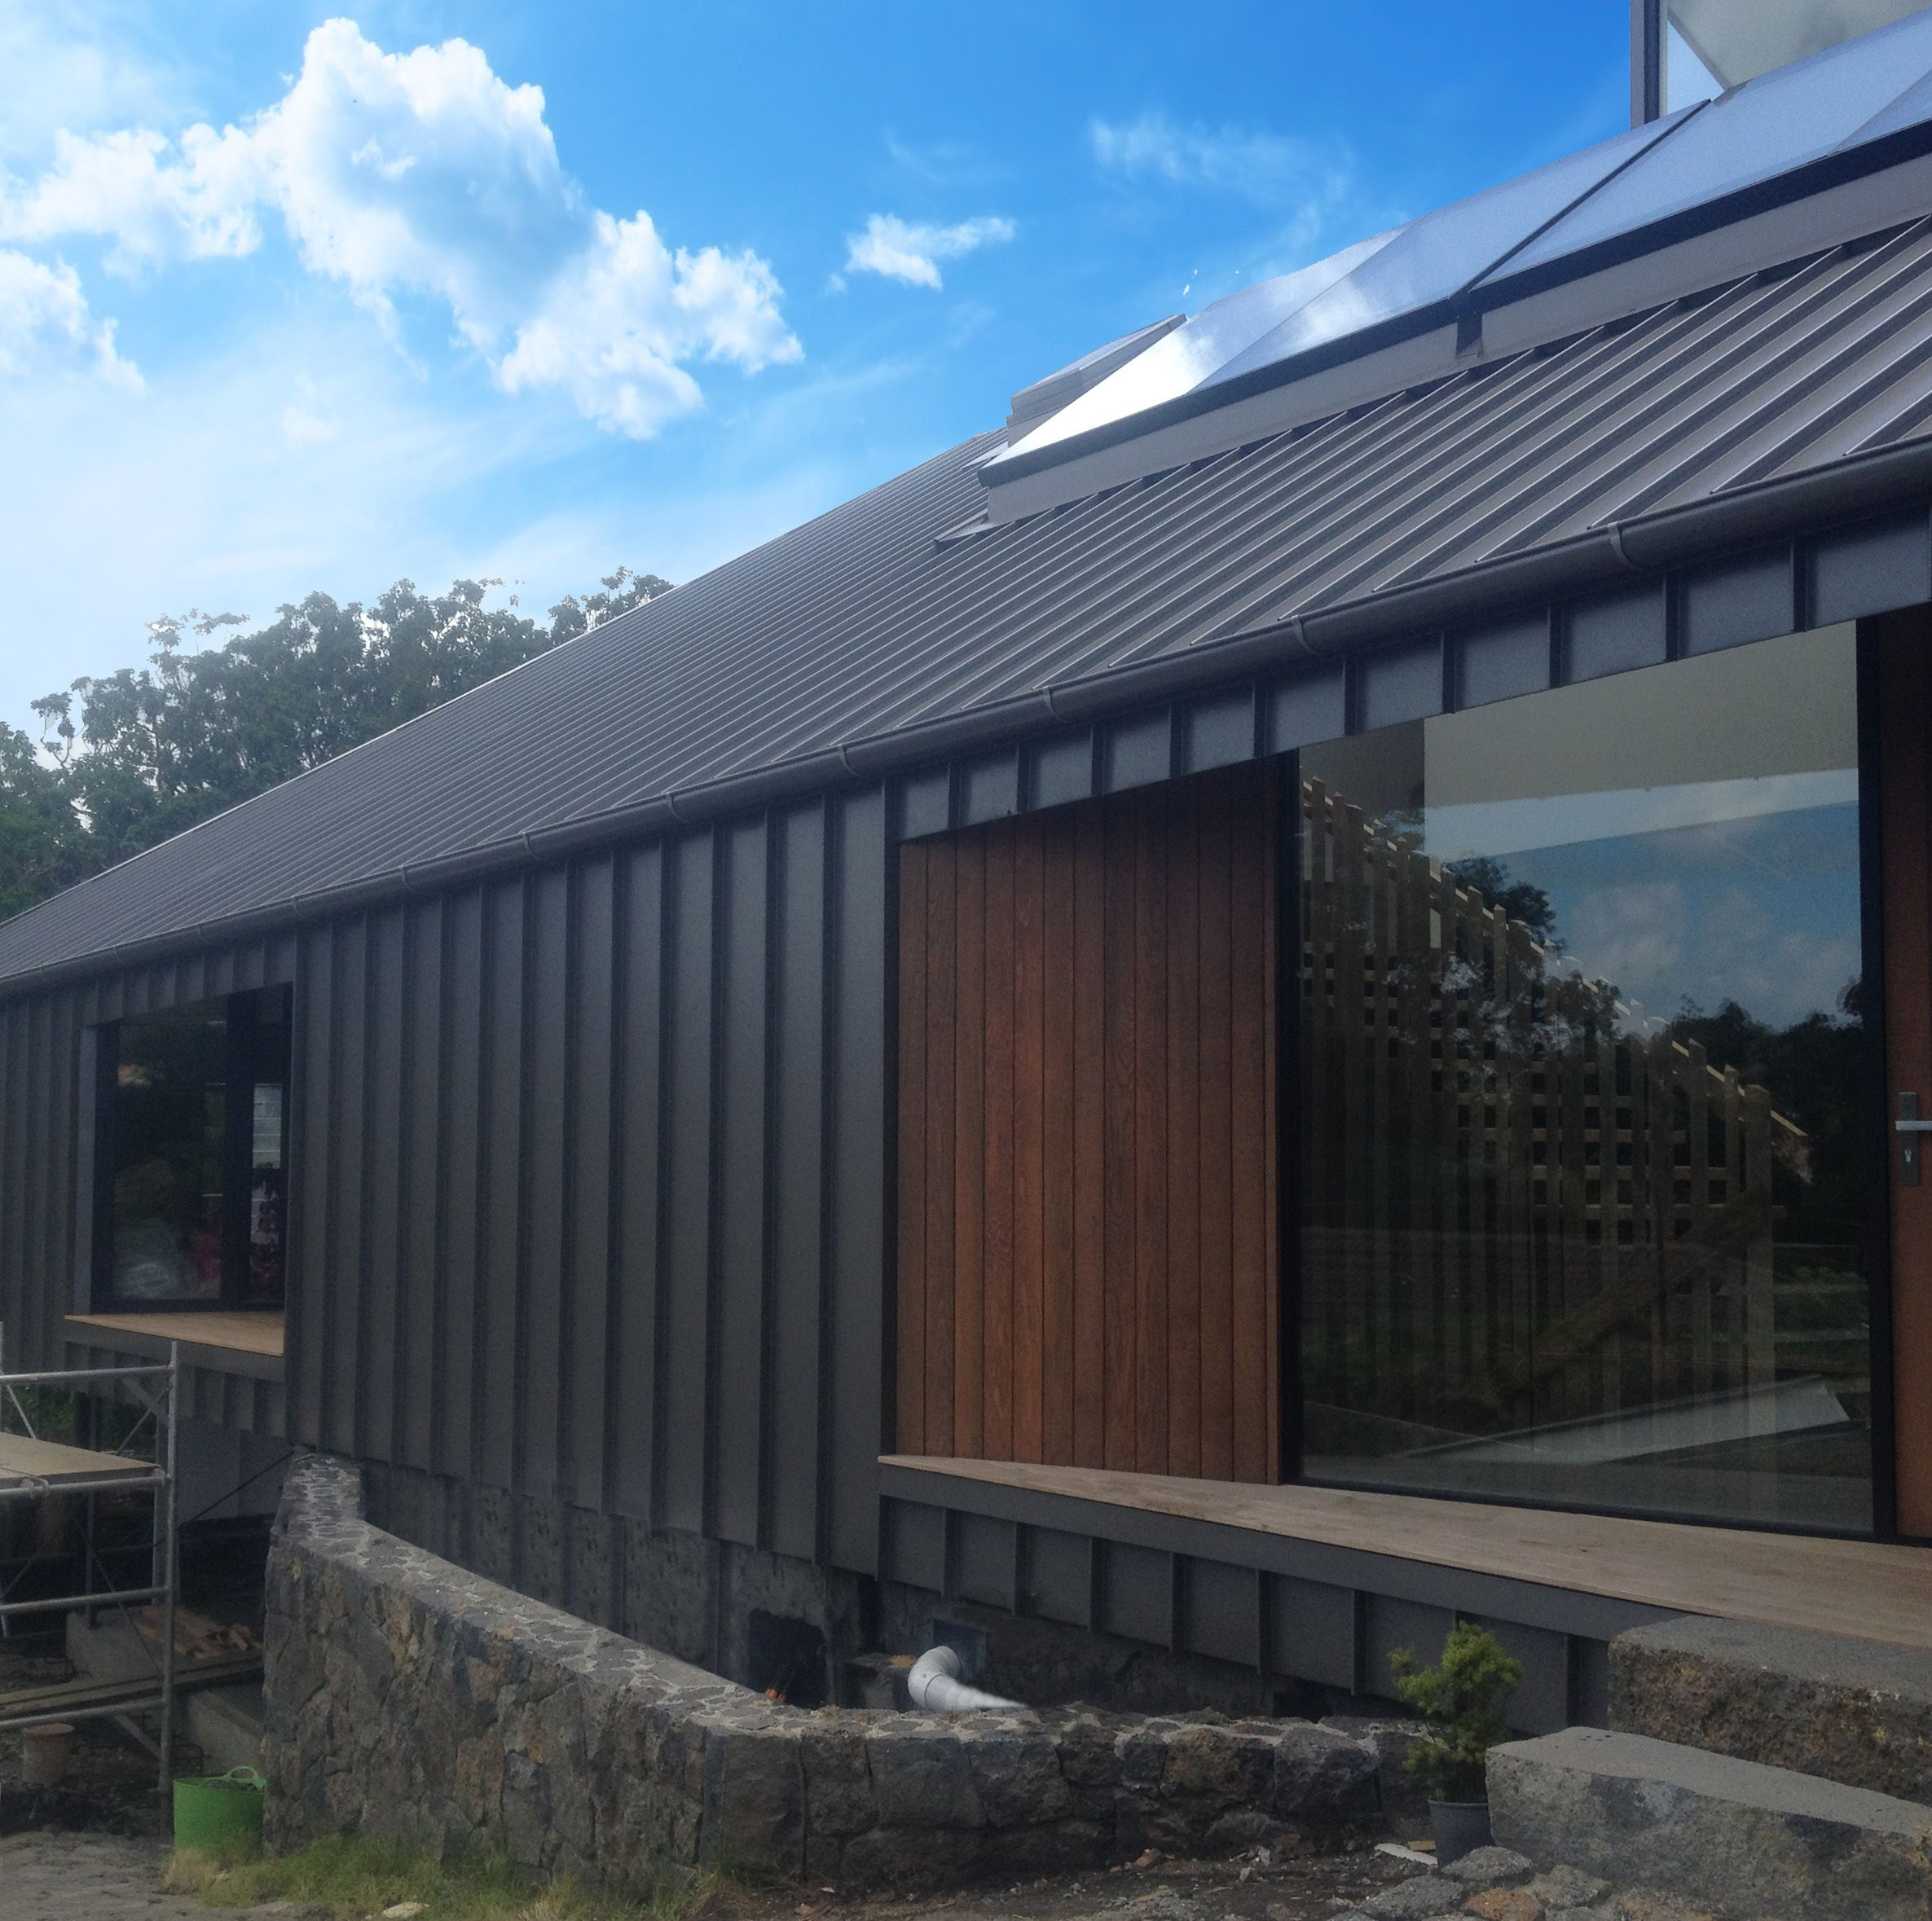 Espan Riteline Roofing House Cladding Facade House Brick Cladding